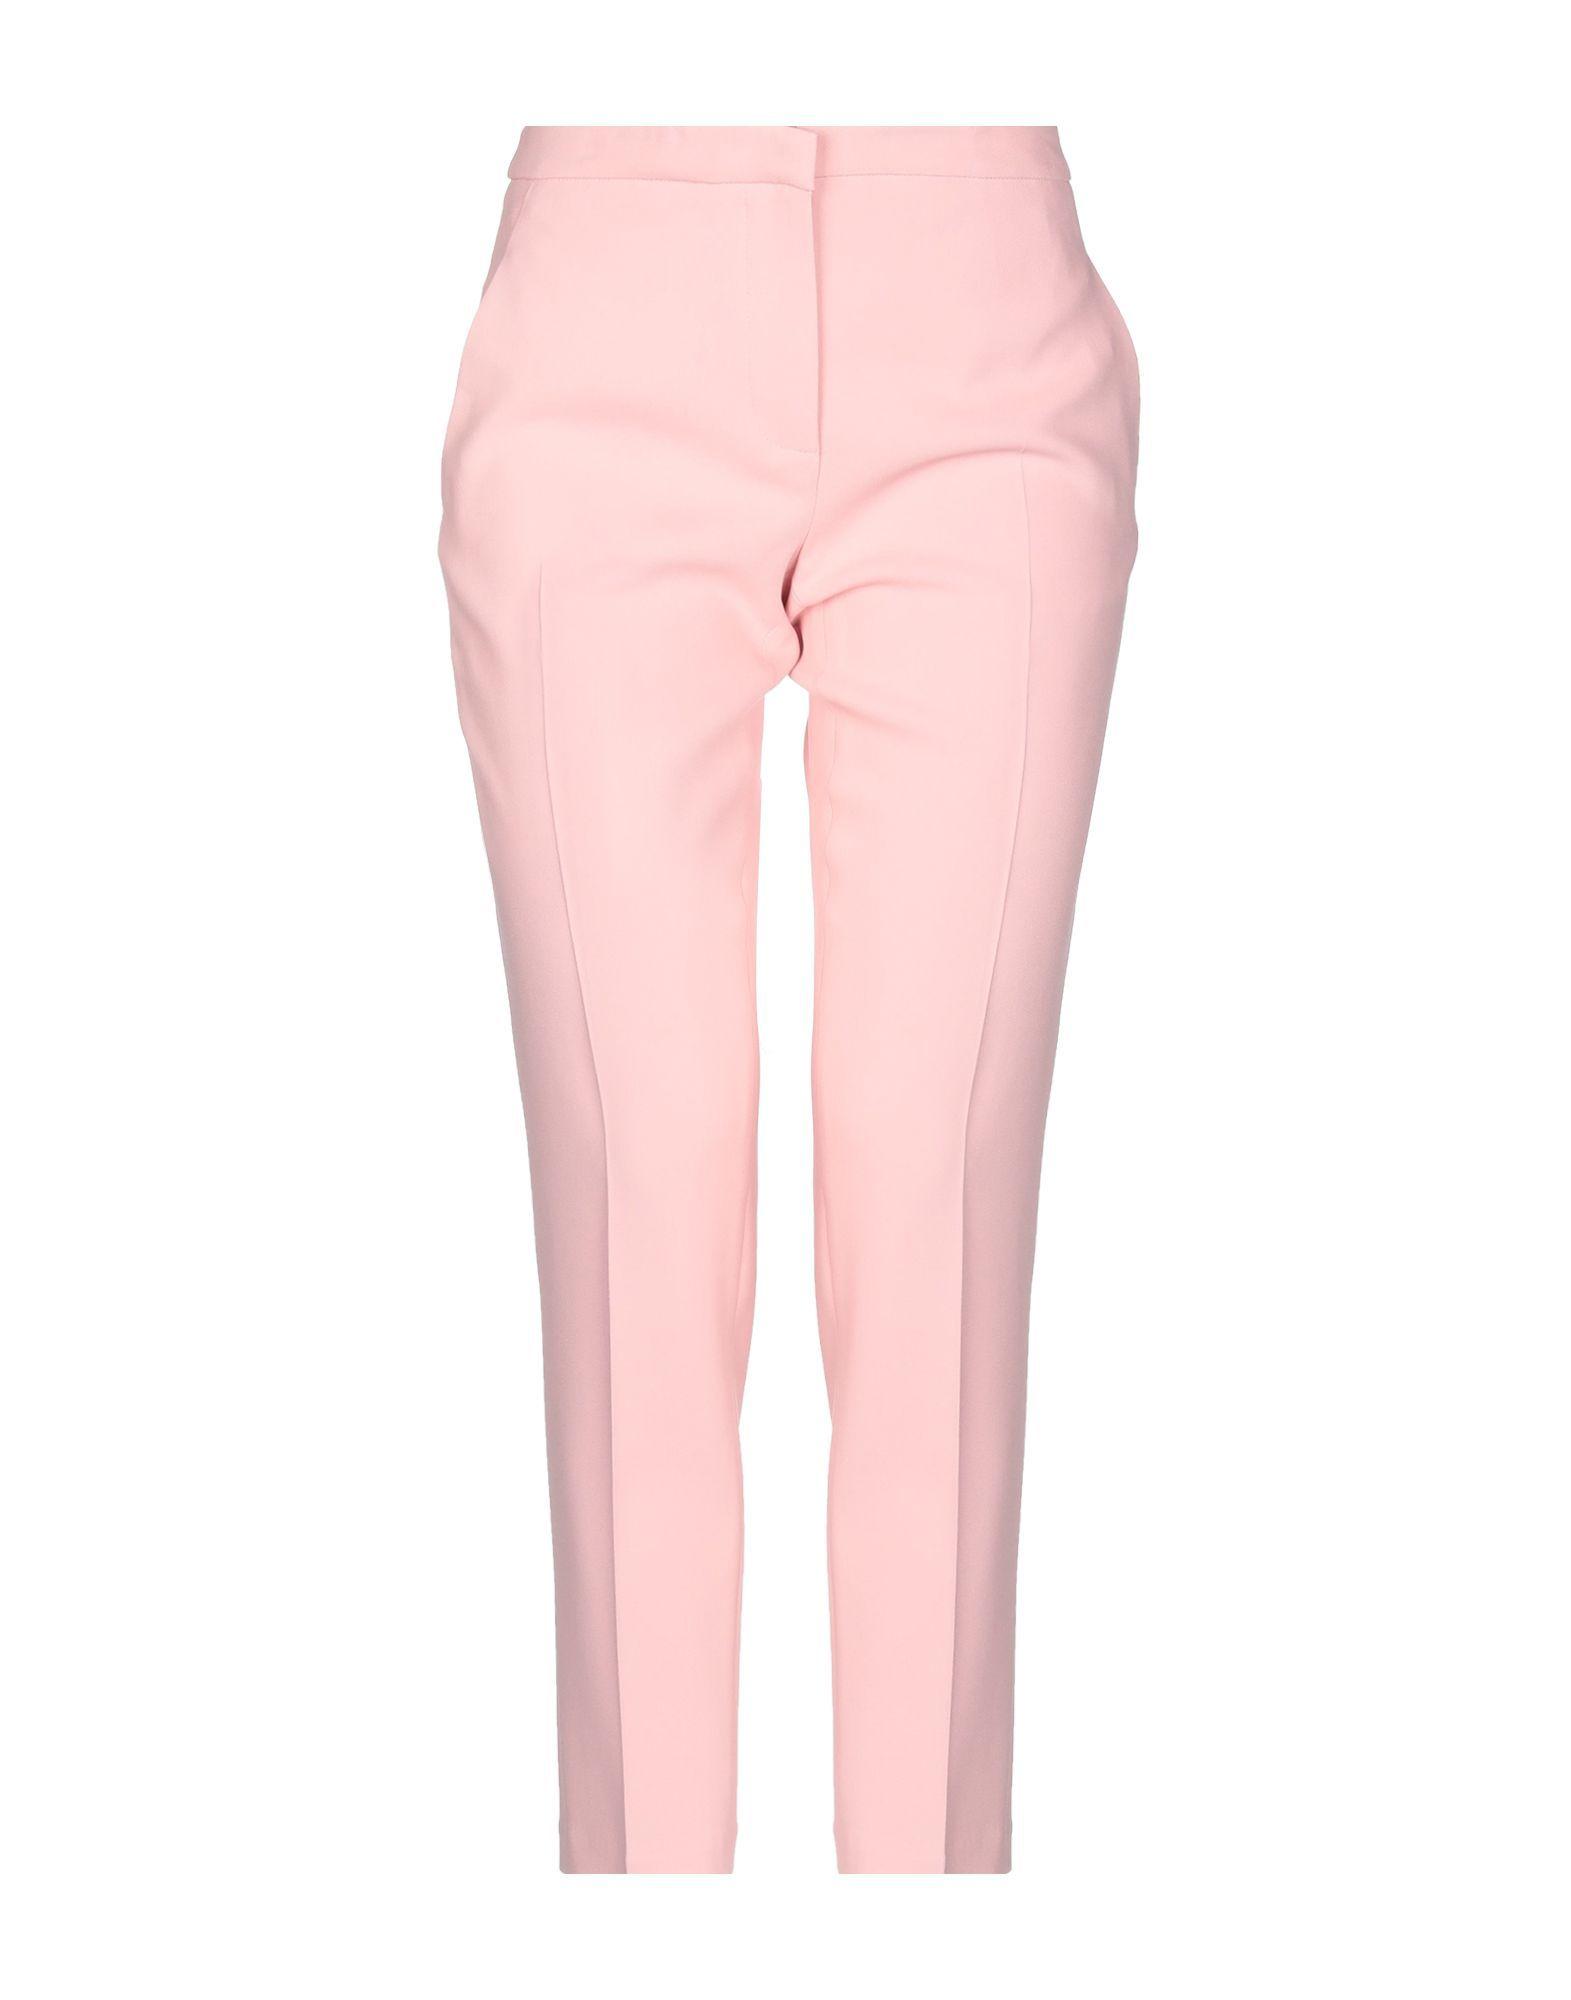 Trousers Twisty Parallel Universe Pink Women's Viscose